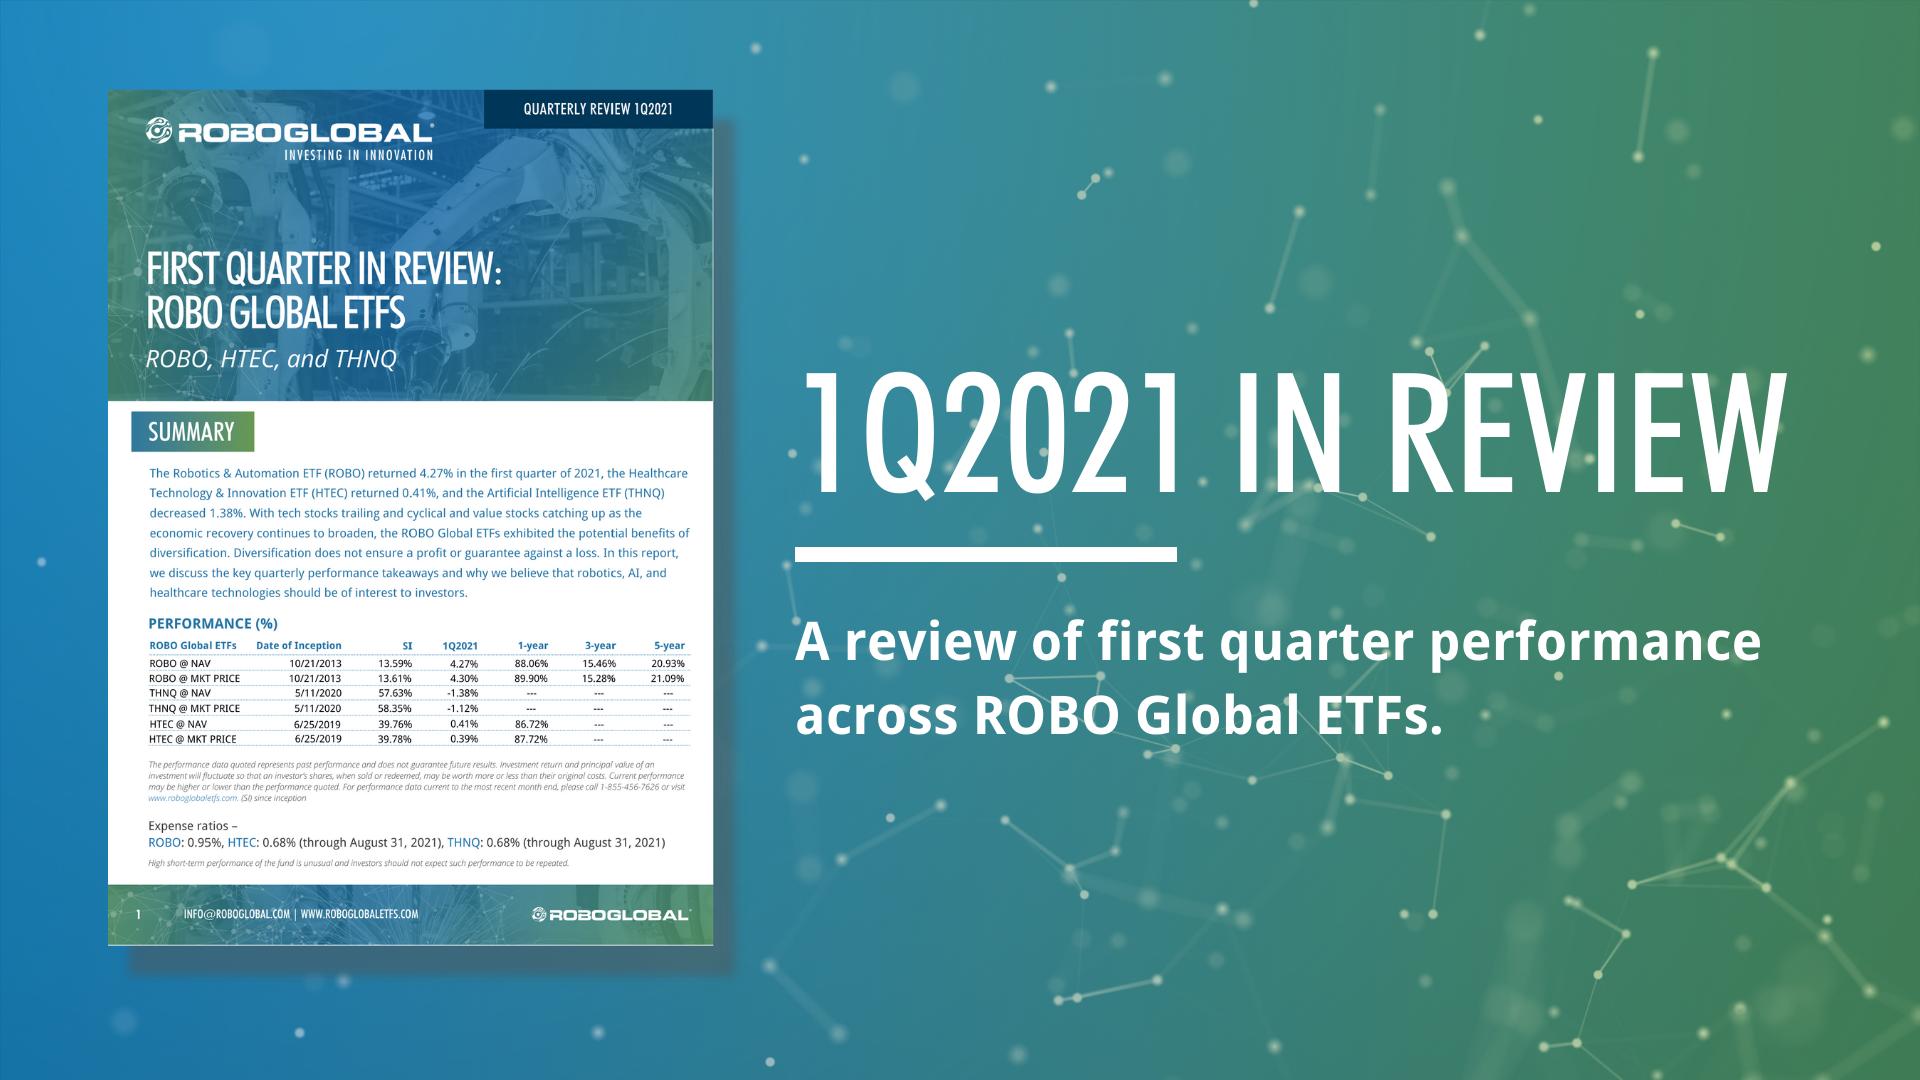 Q1 2021 Performance Report: ROBO Global ETFs